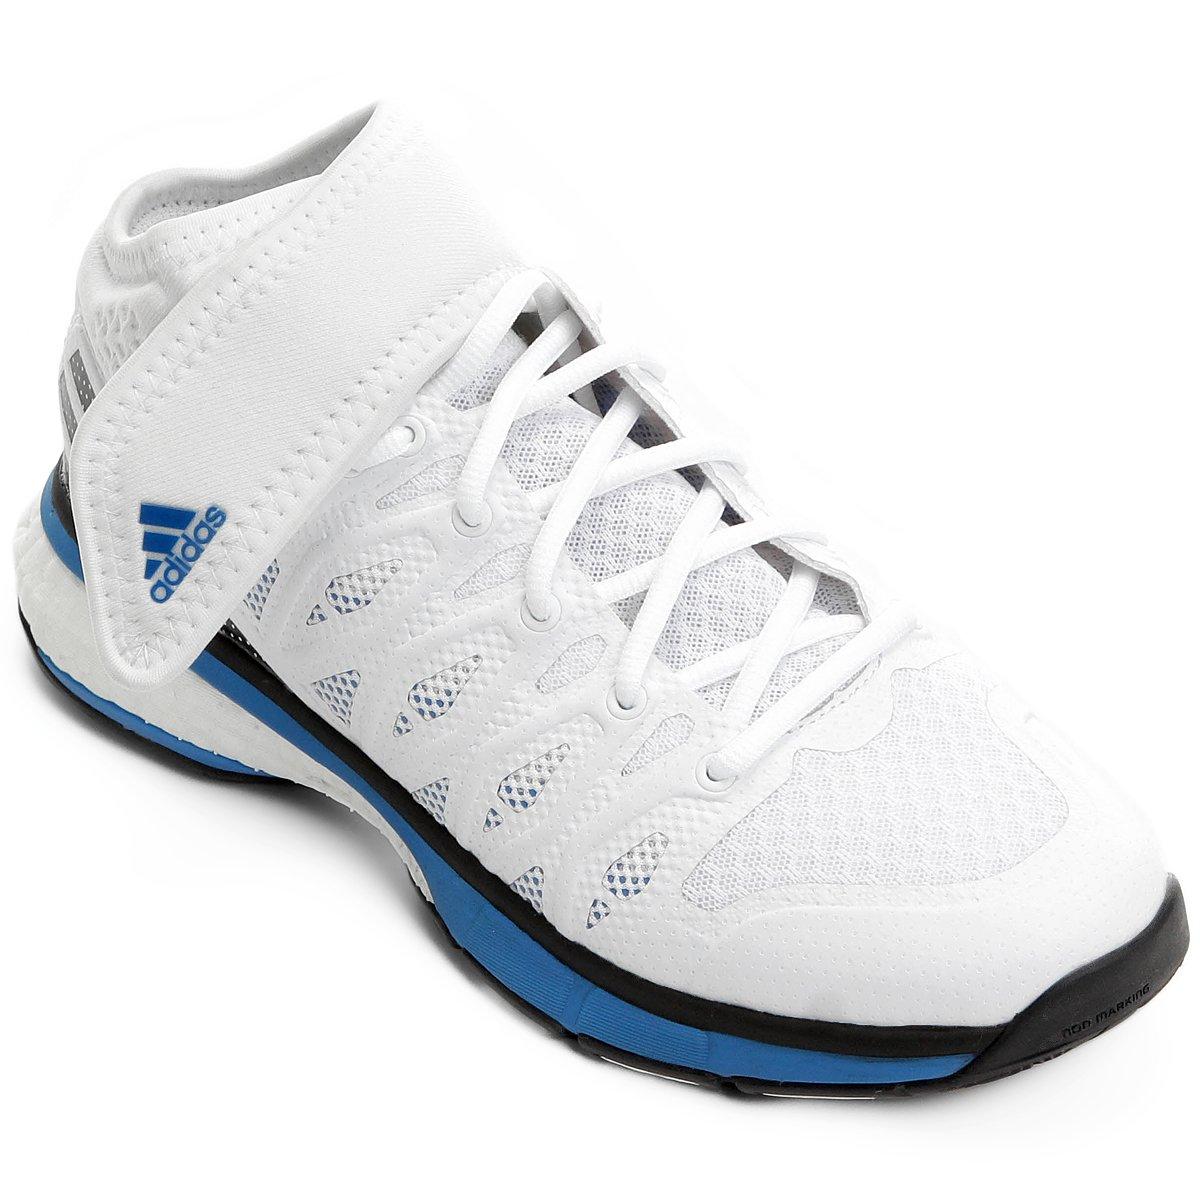 b98eb892cdf Tênis Adidas Energy Volley Boost Mid - Compre Agora